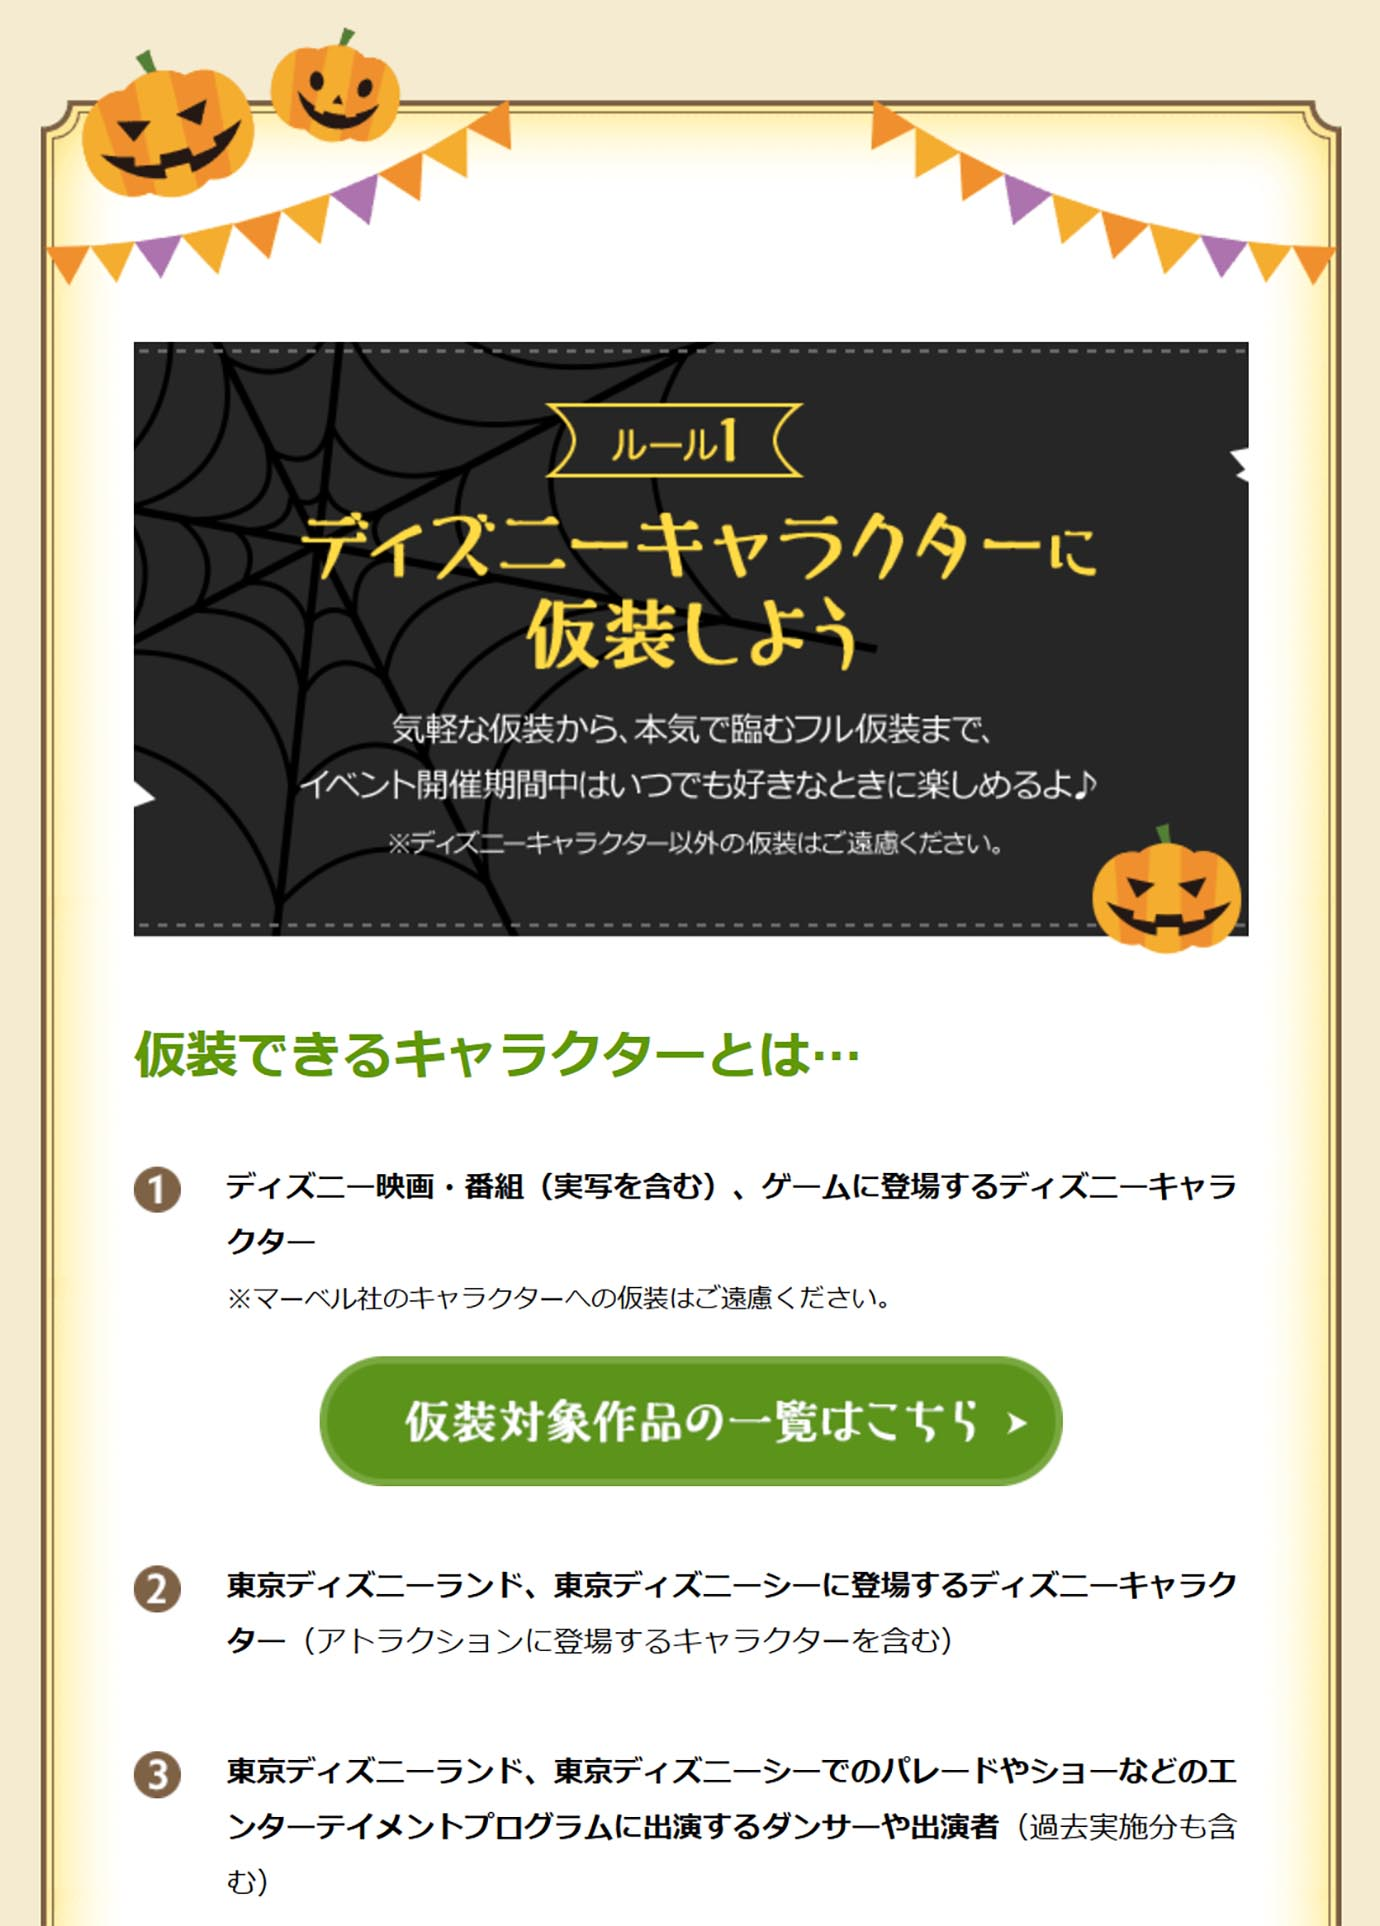 tokyodisneyresort-marvel-halloween